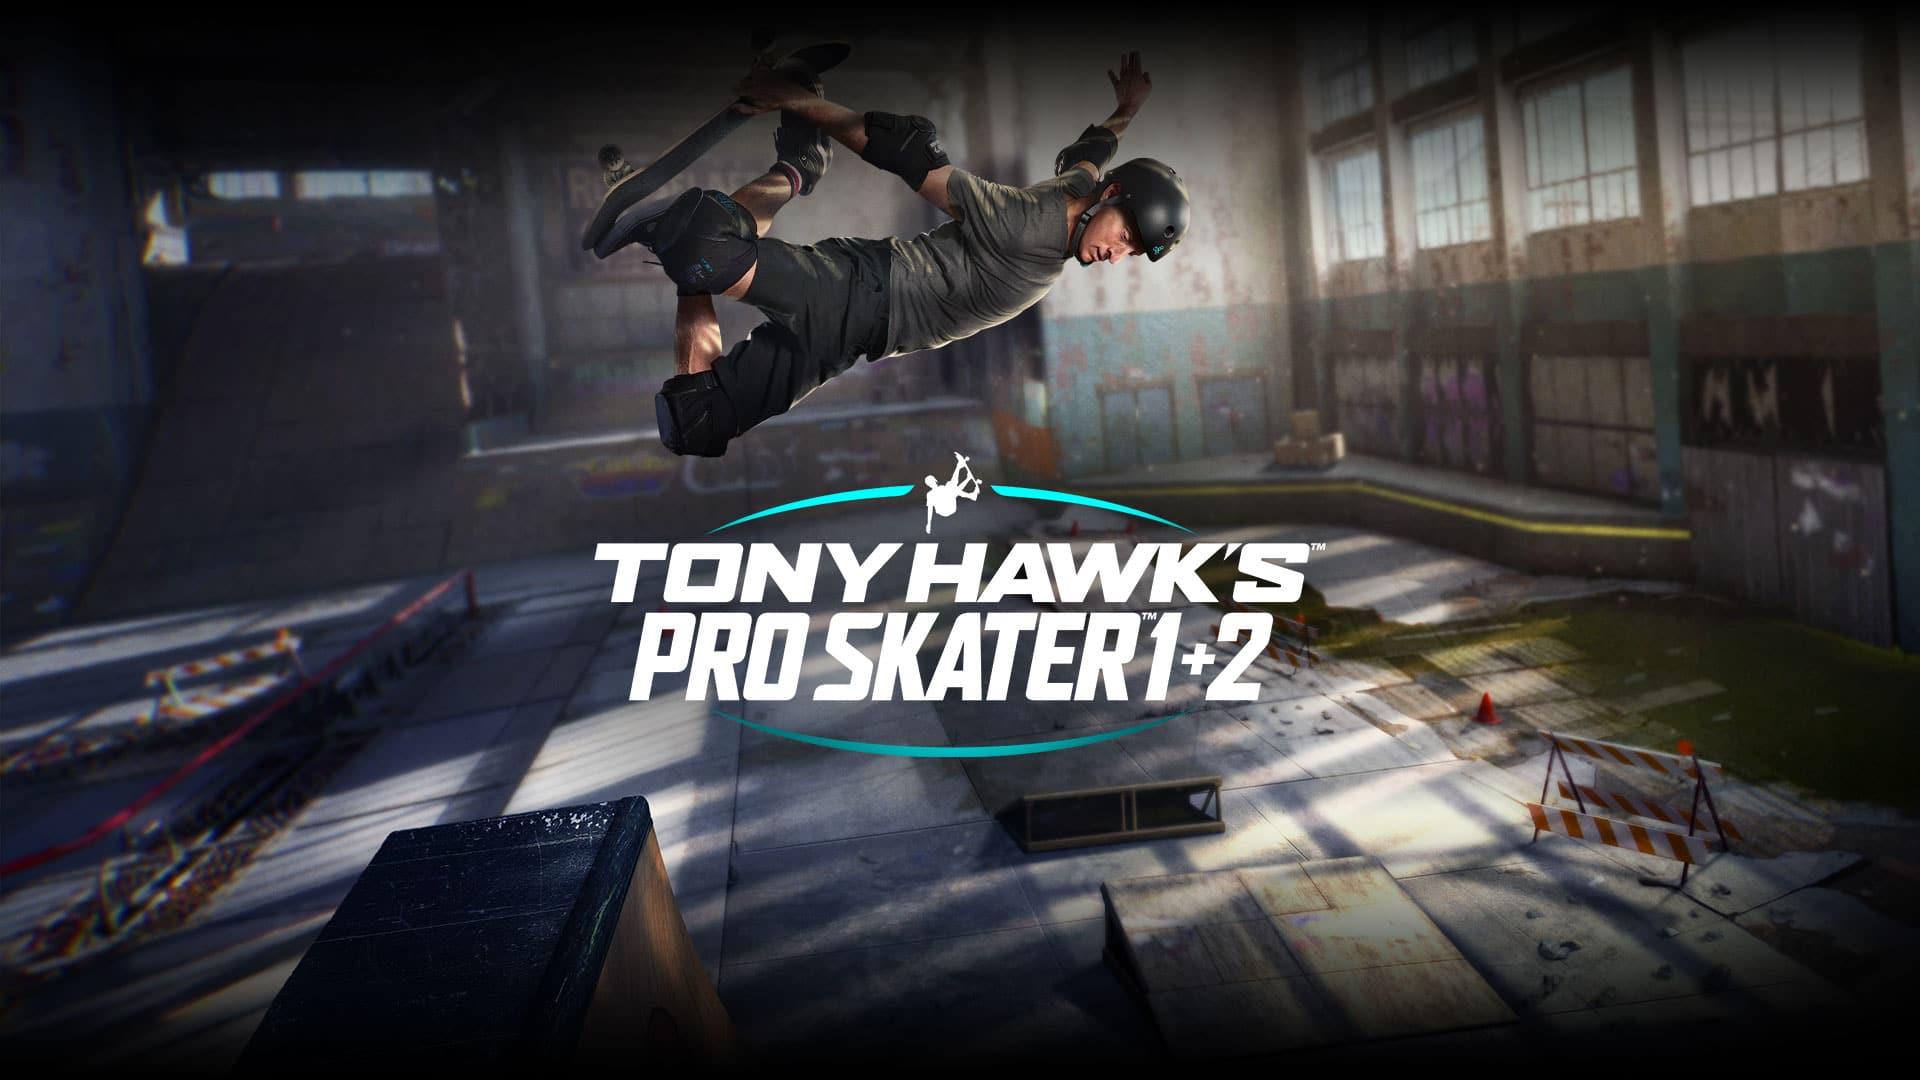 Tony Hawk Pro Skater 1+2 (Game)